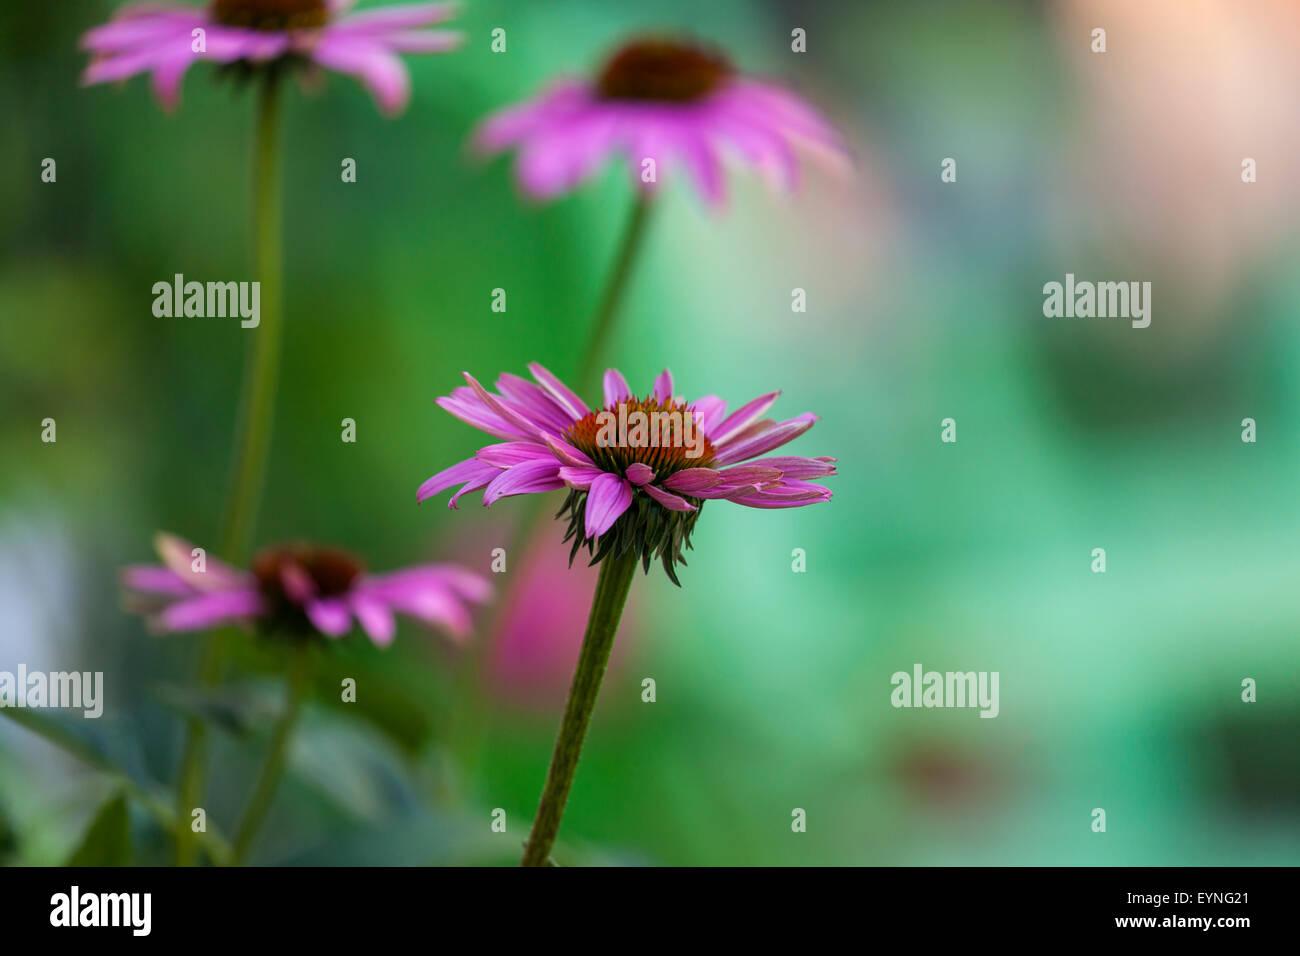 Echinacea purpurea blooming,eastern purple coneflower,purple coneflower - Stock Image